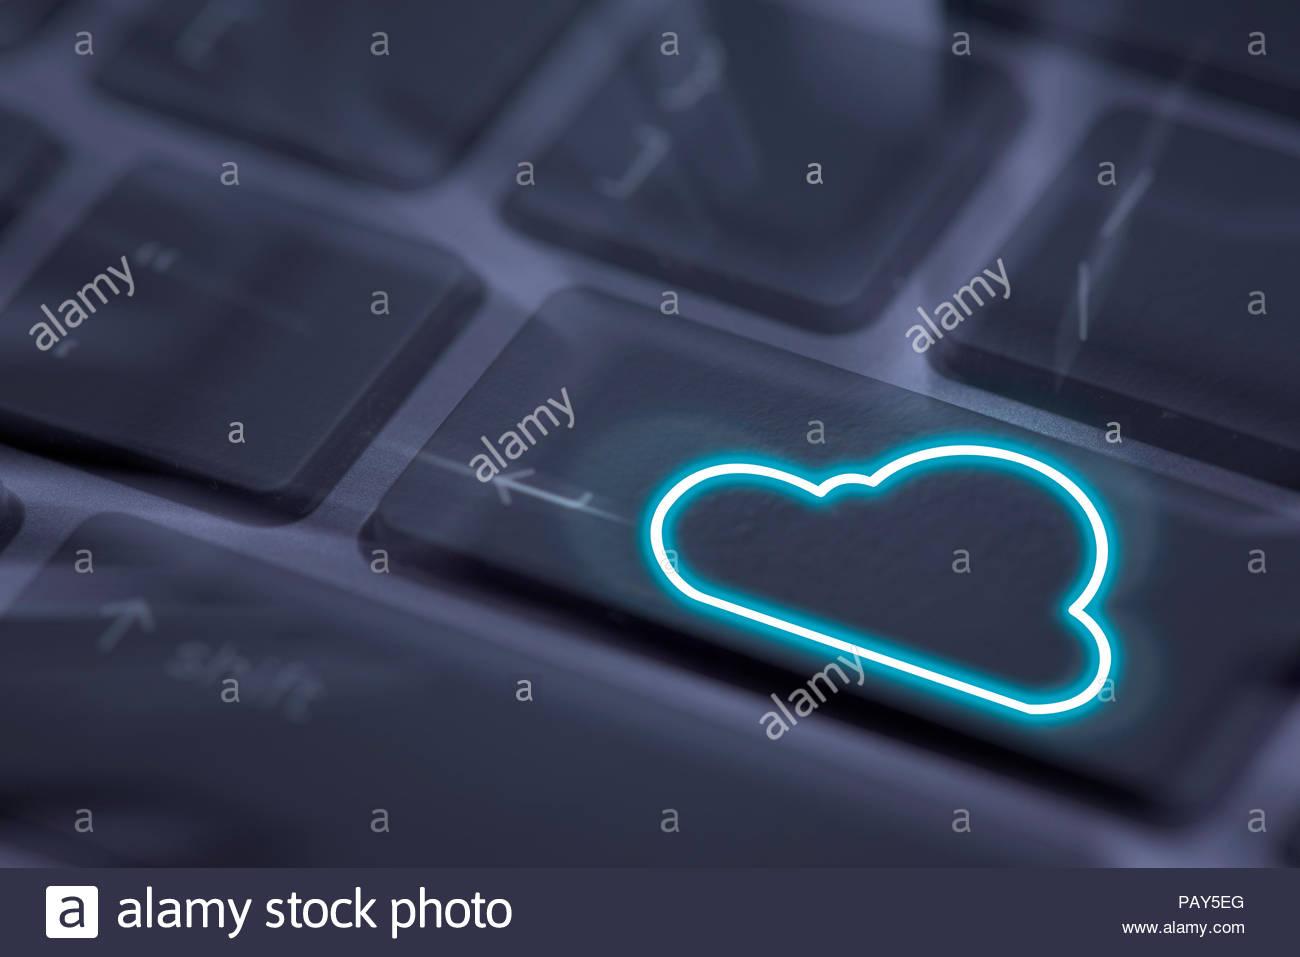 Cloud computing concept, clound computing icon on keyboard - Stock Image